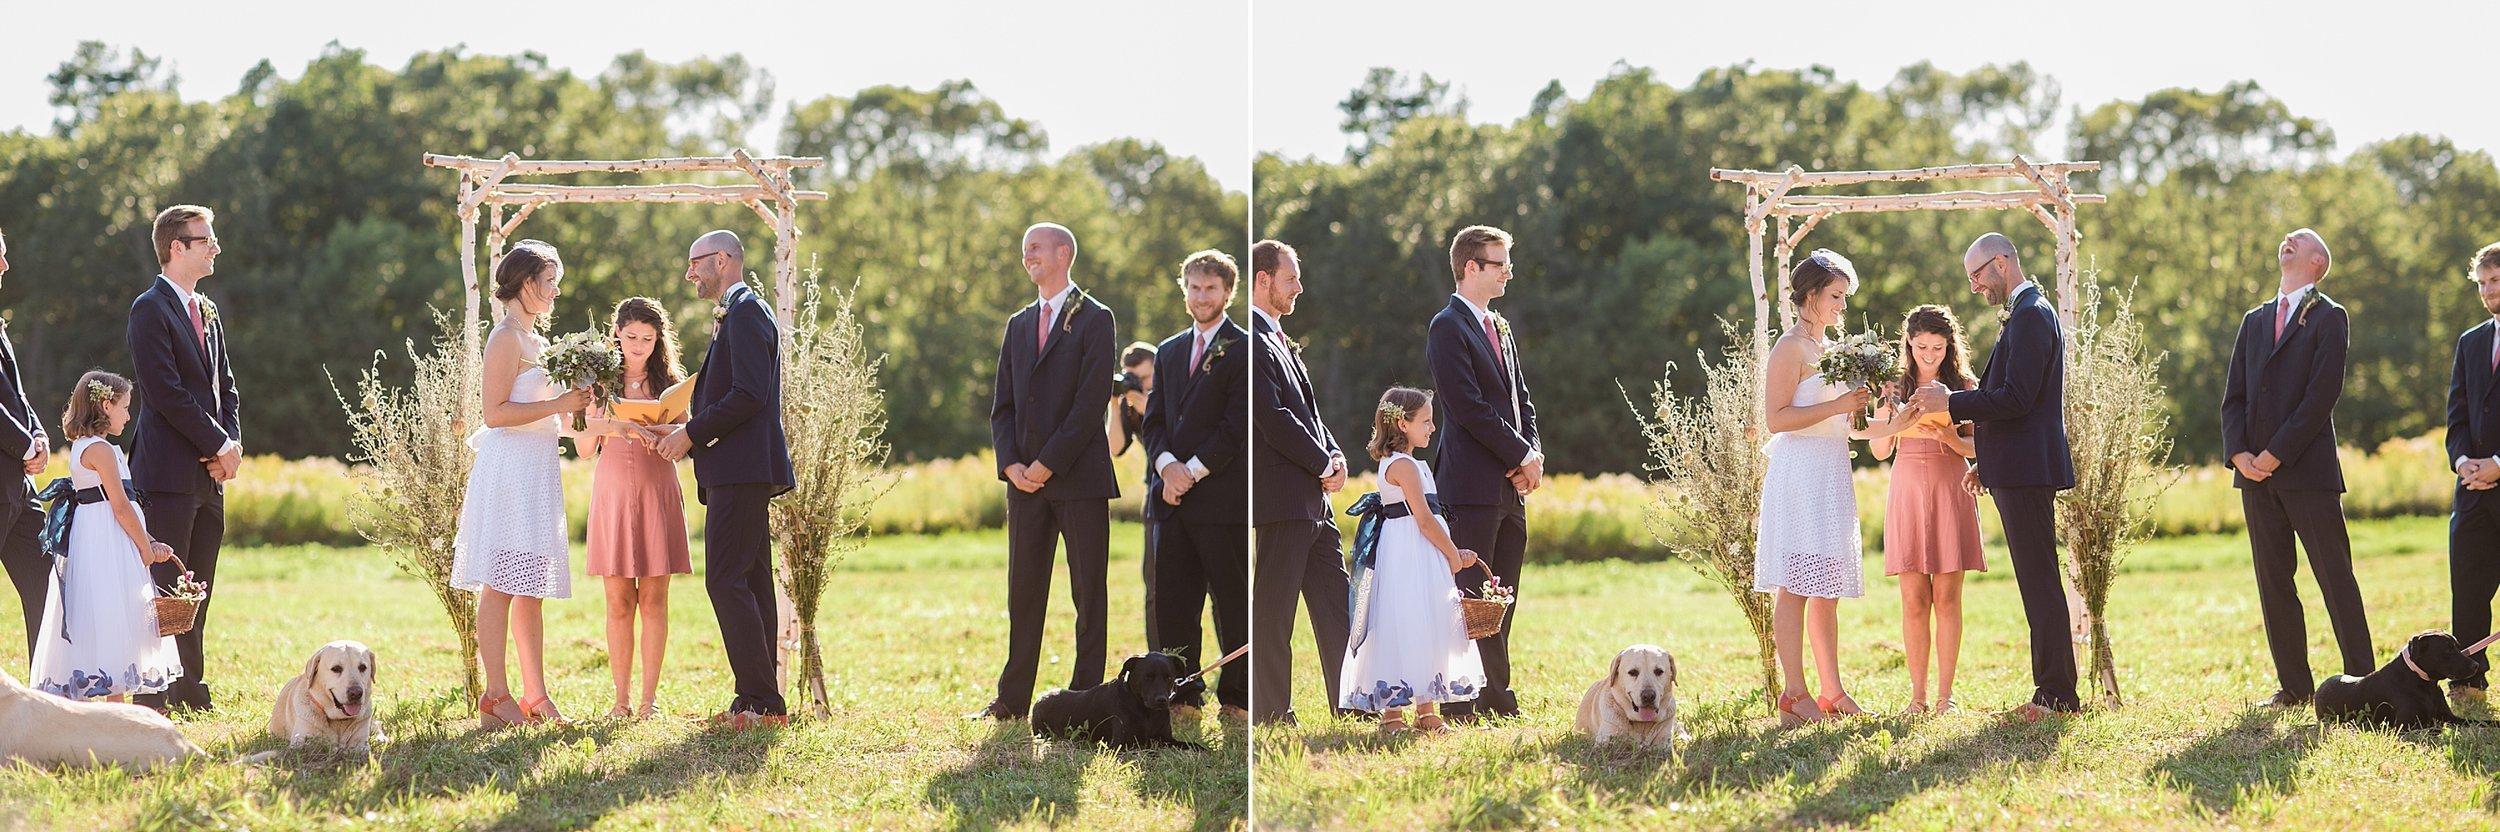 046 los angeles wedding photographer.jpg